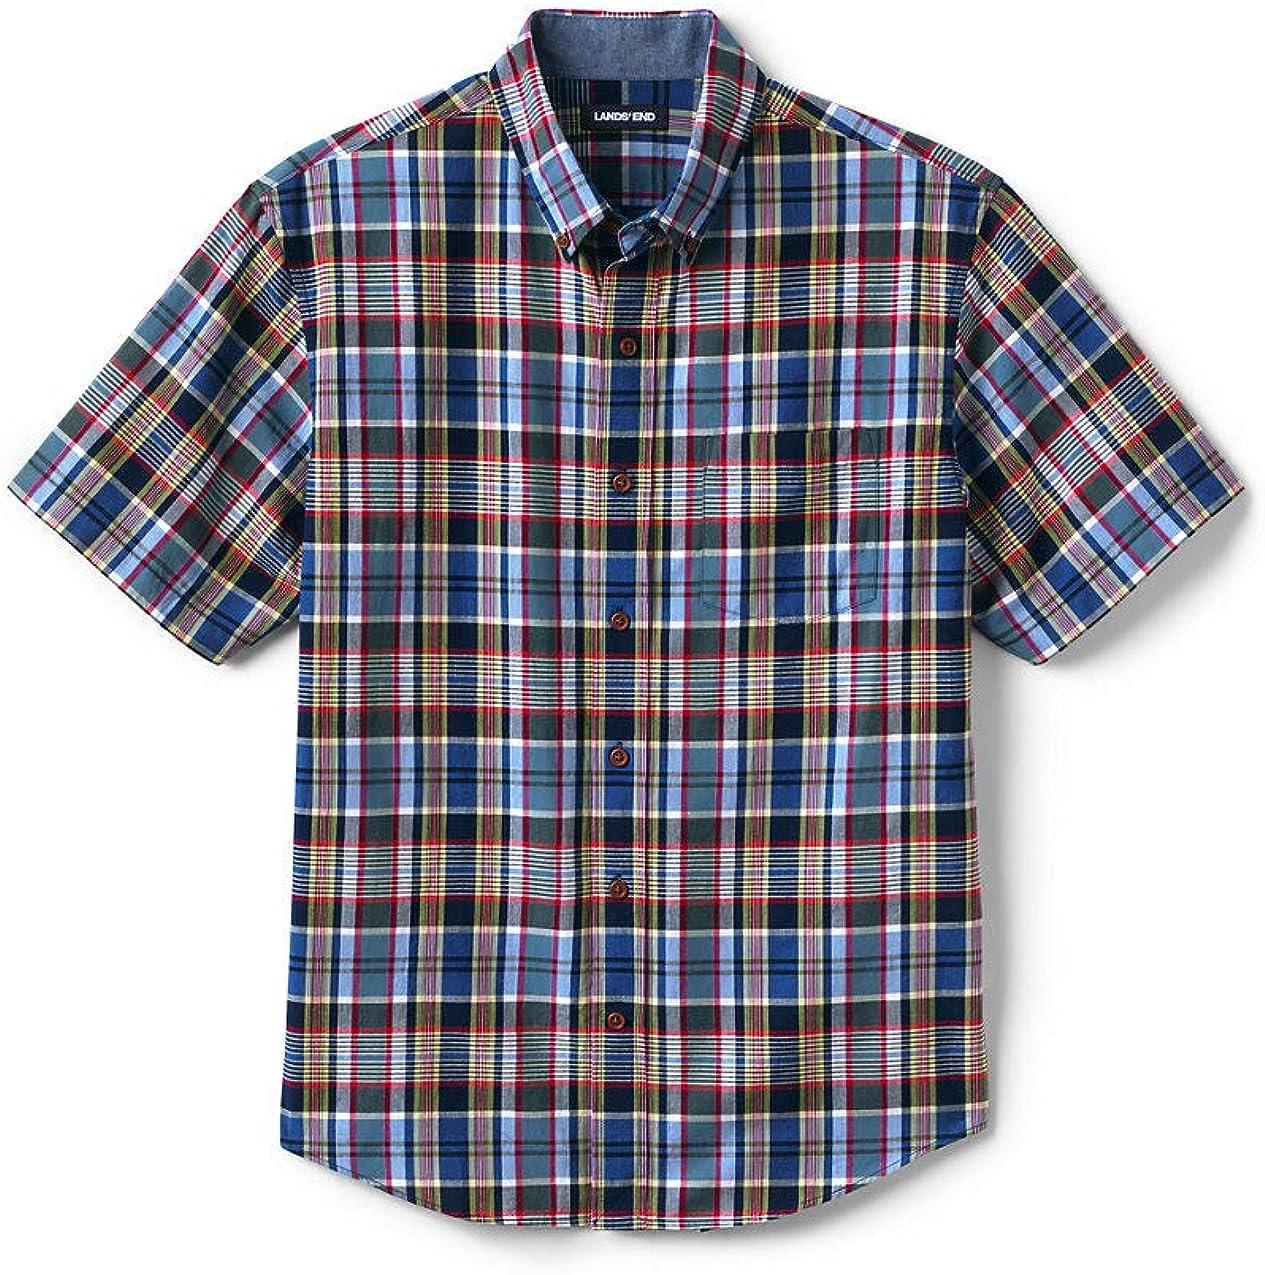 Lands' End Men's Traditional Fit Short Sleeve Madras Shirt